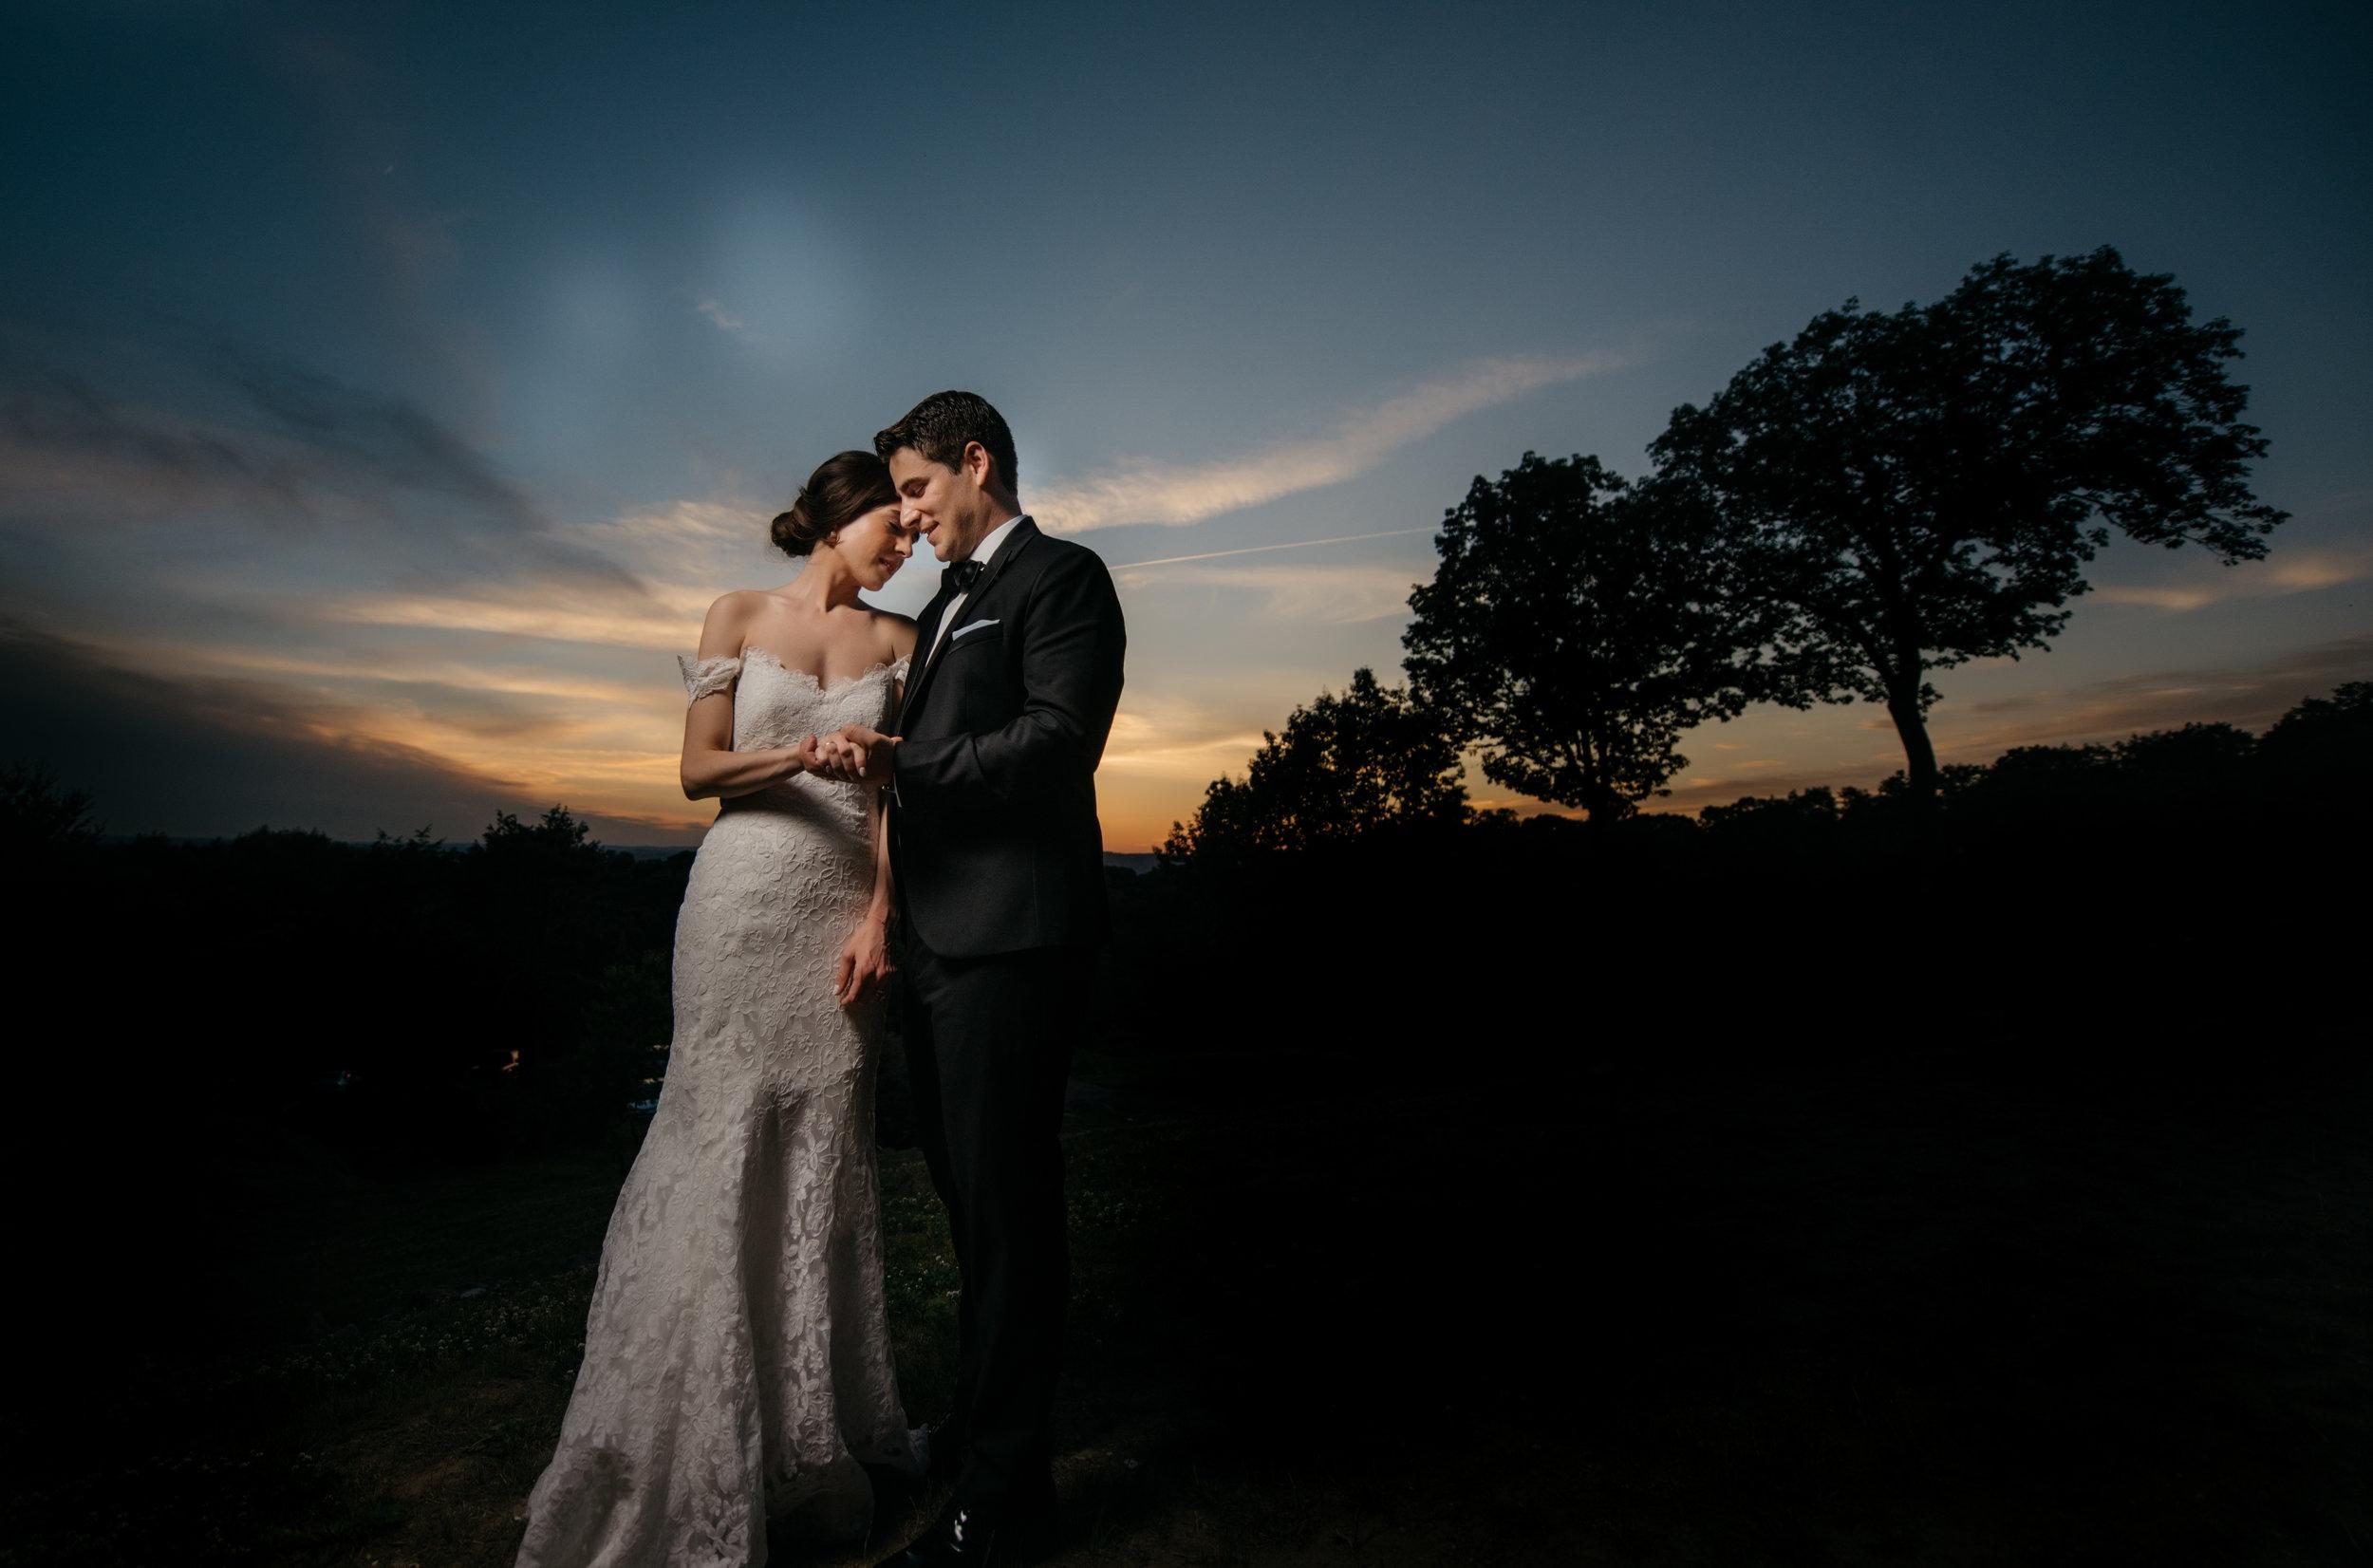 WeddingPhotos | NJPhotographer | Highlights-9-3.jpg